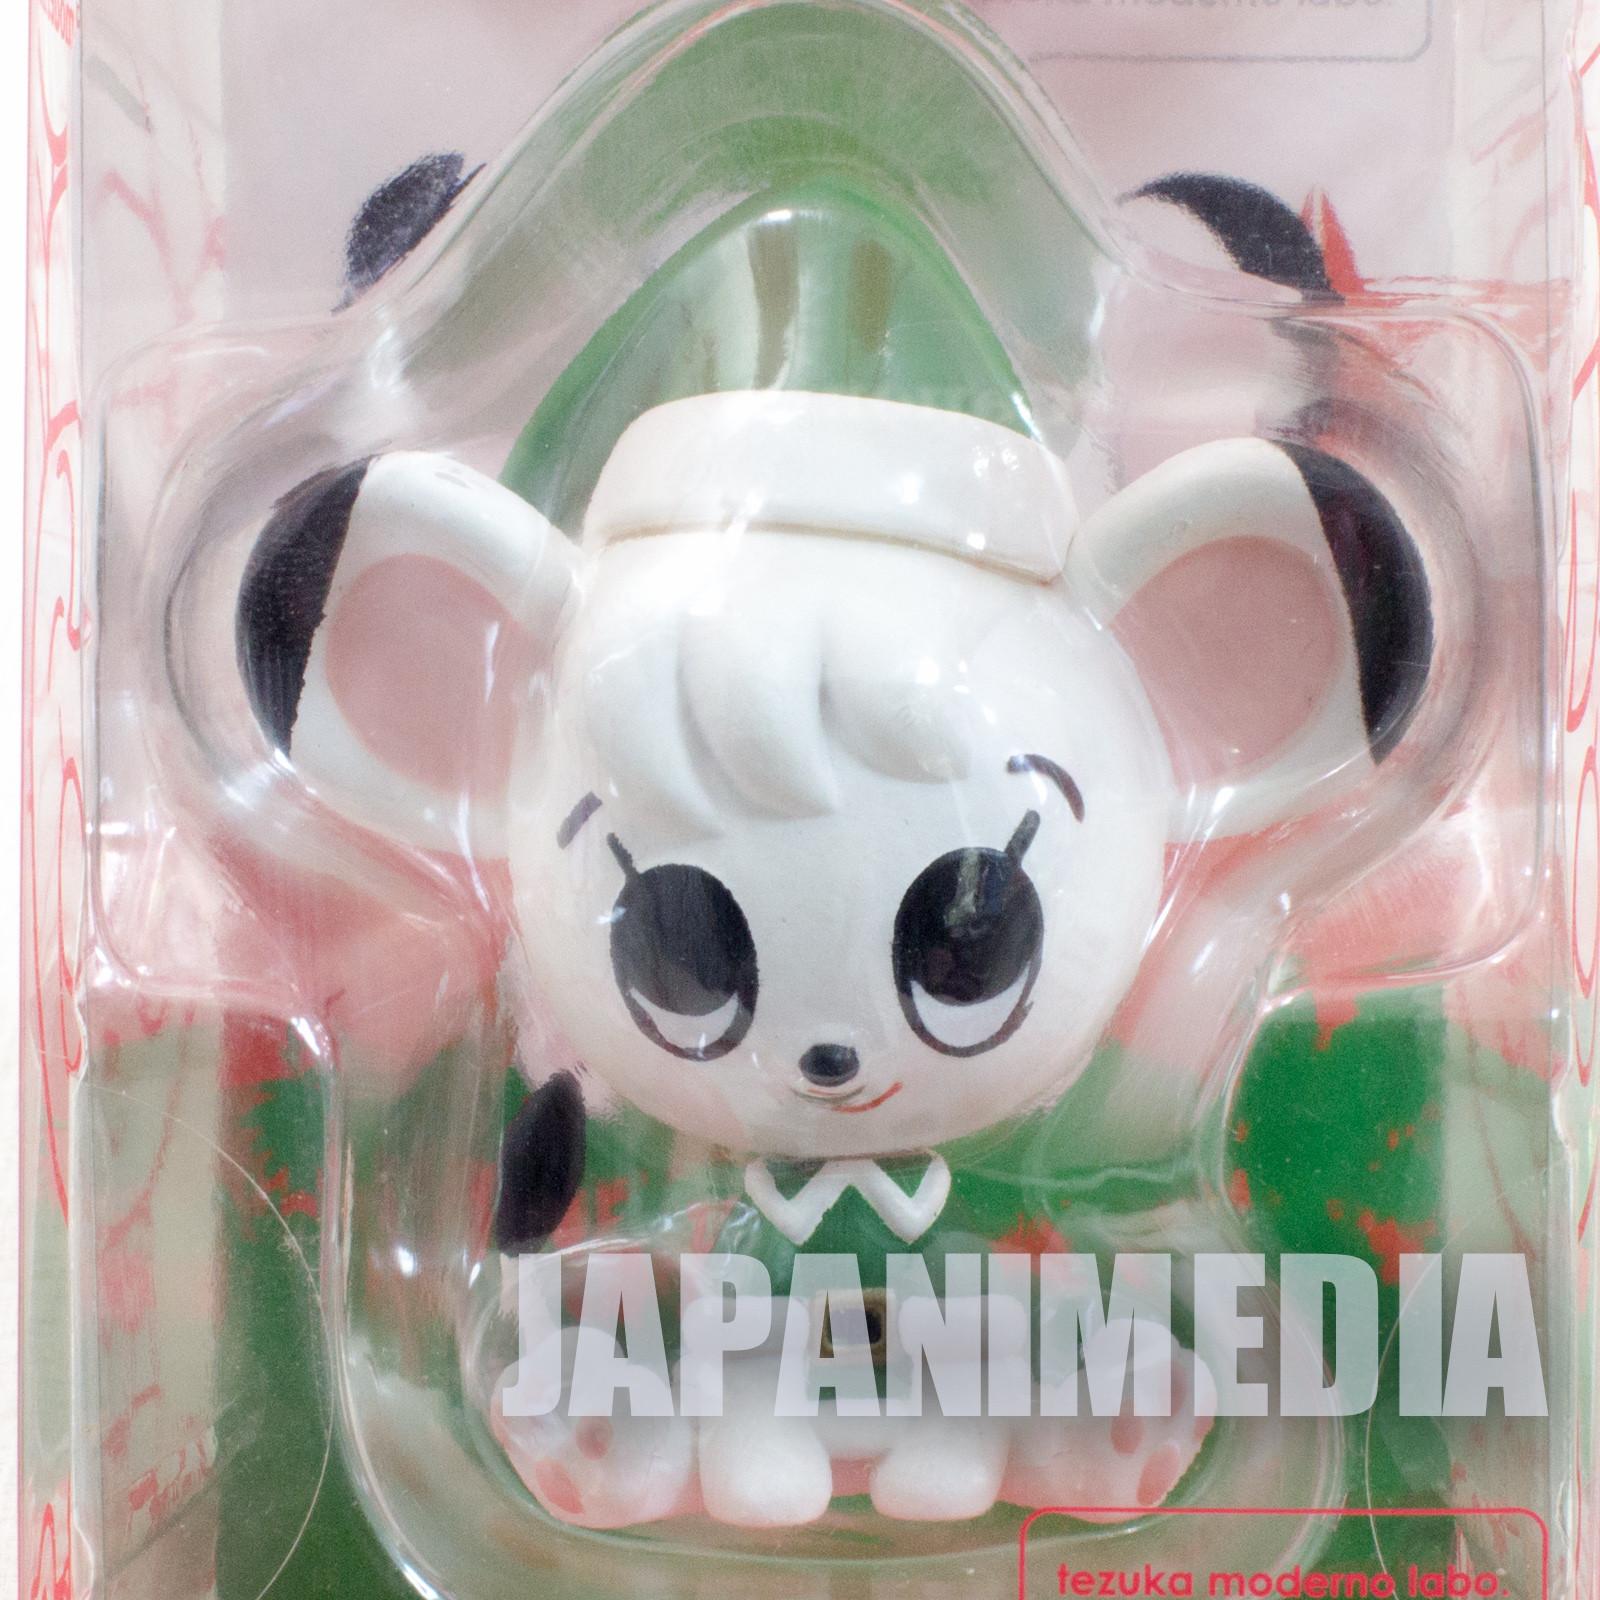 Jungle Emperor LEO Green Santa Moderno Labo Figure Tezuka Osamu Organic JAPAN